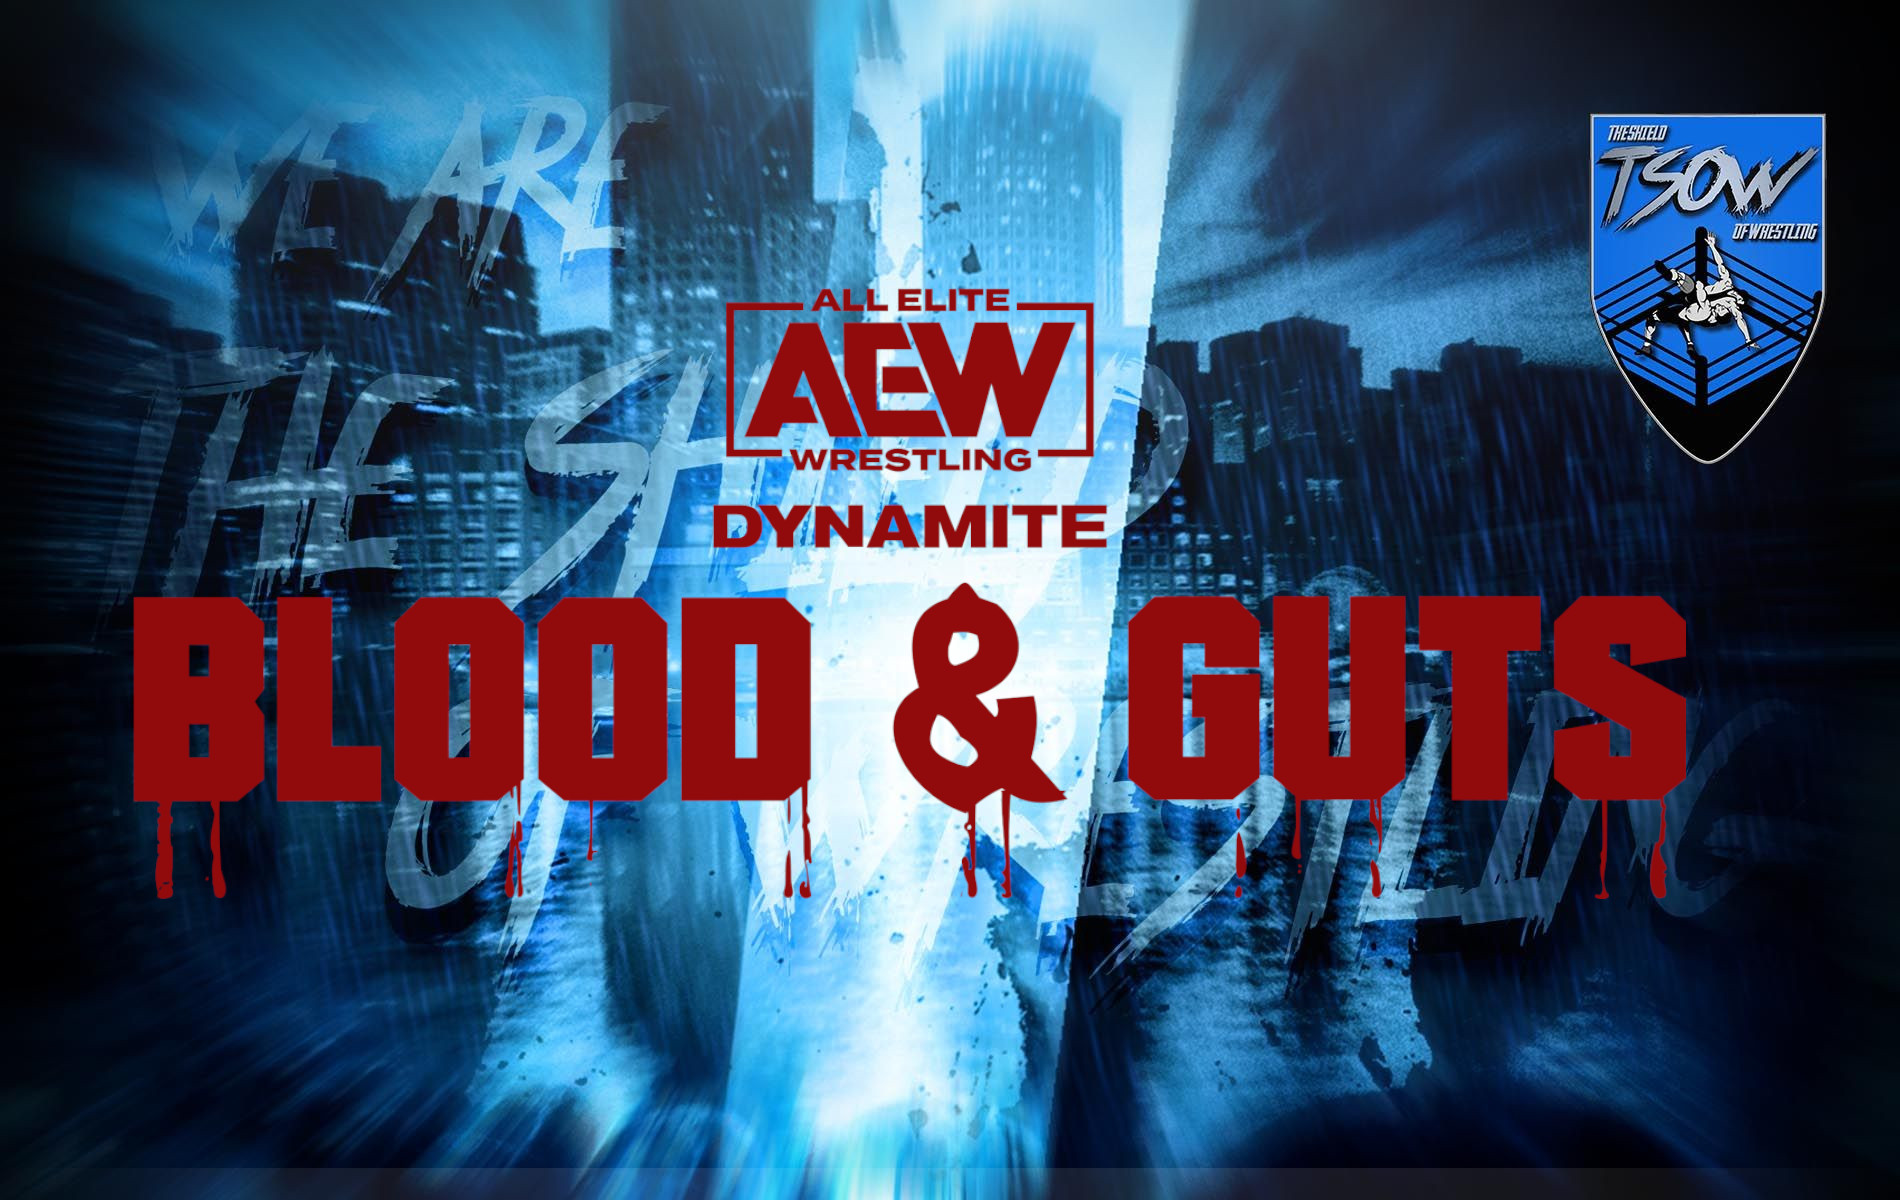 Blood and Guts: aggiunti altri match alla card